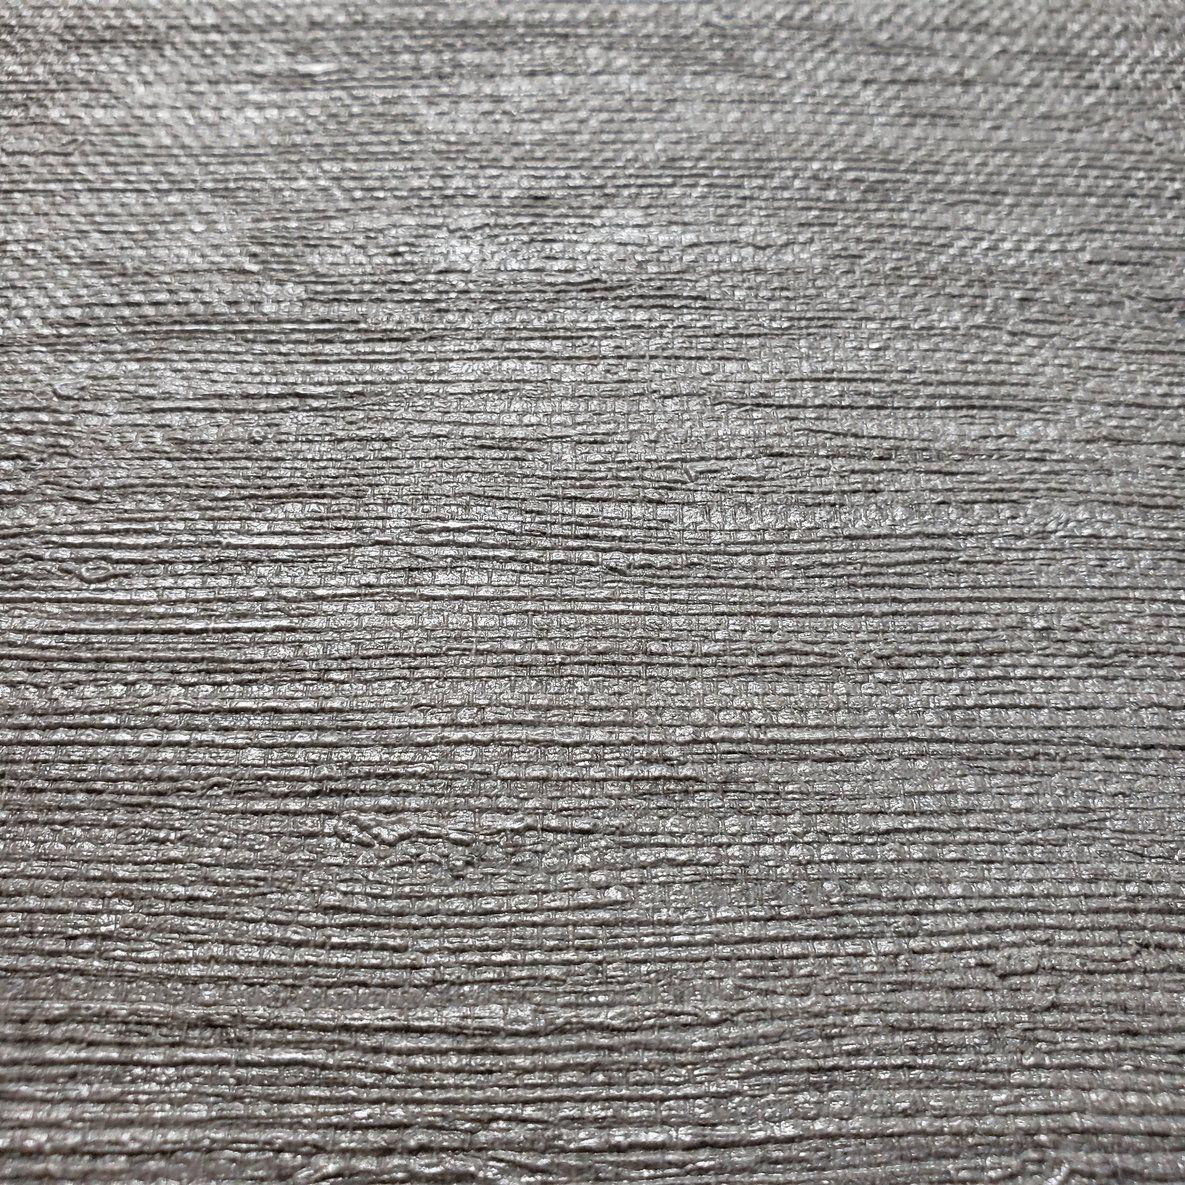 WM8800401 Modern Wallpaper Rustic Gray Silver metallic